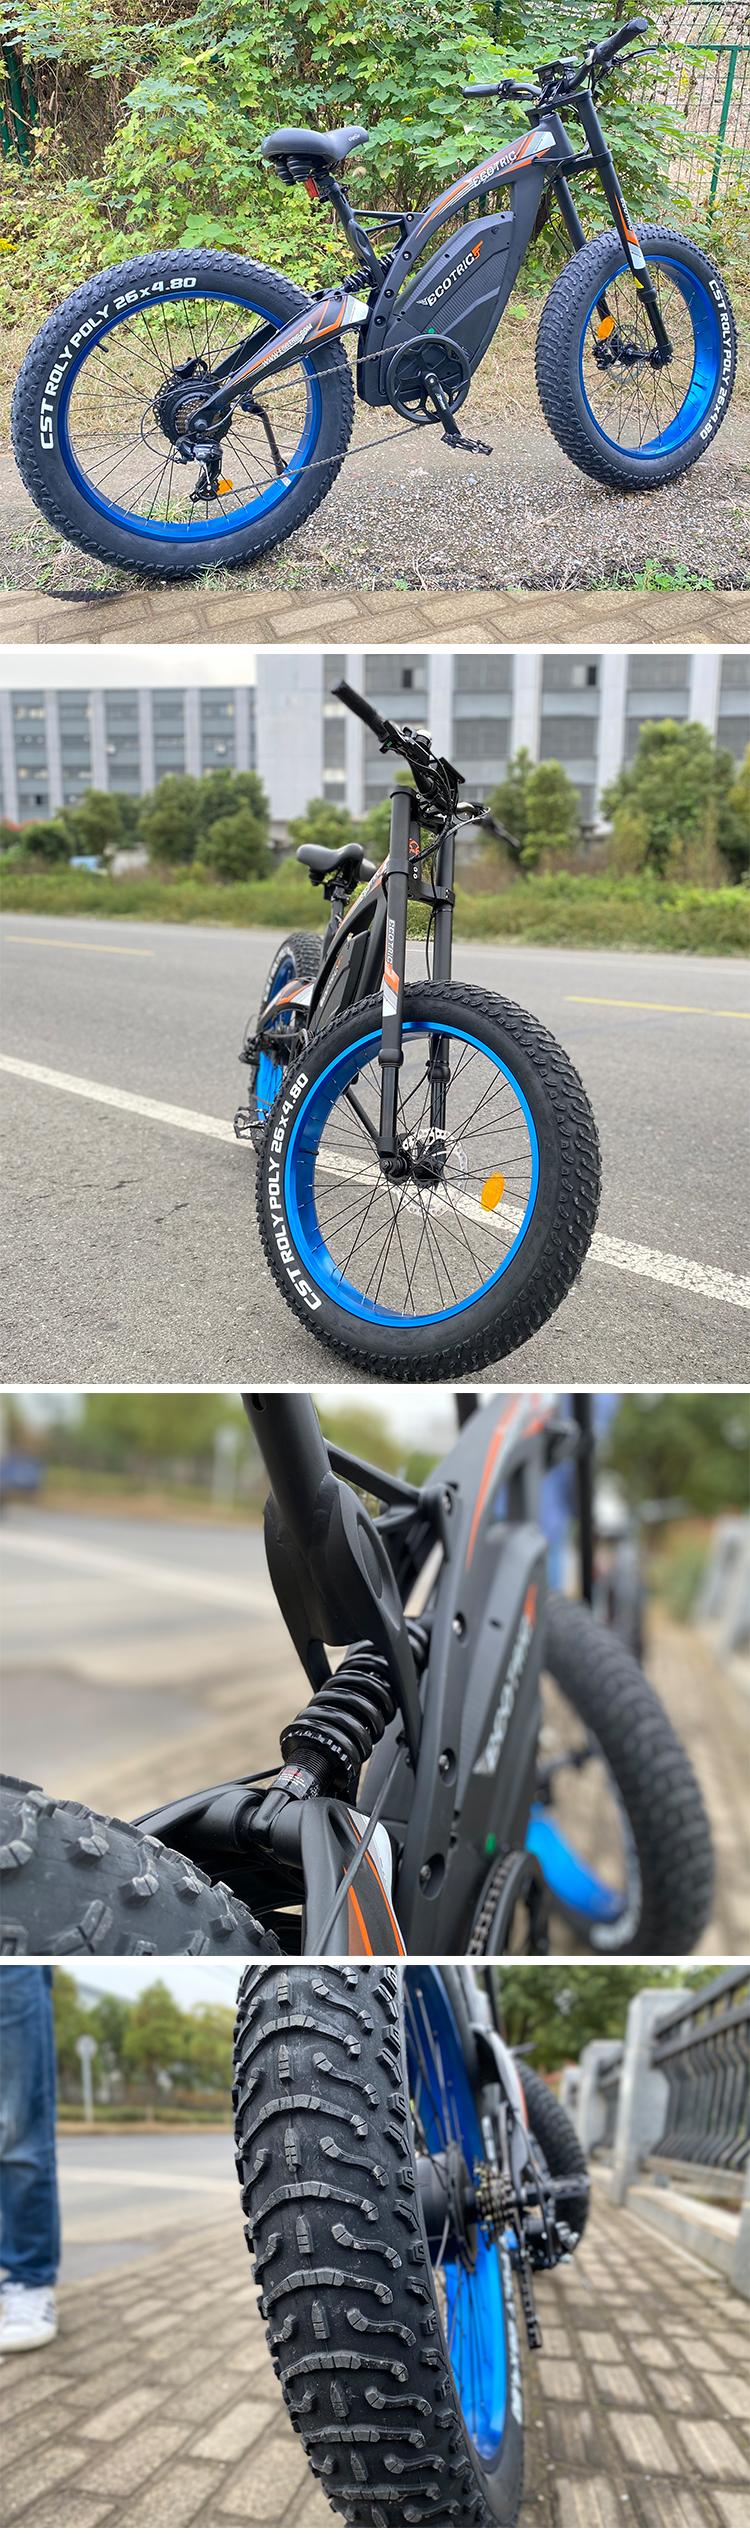 Super power 45 km e bike  high speed 48v 1000w 1500w ebike full suspension fat bike electric bicycle with high quality